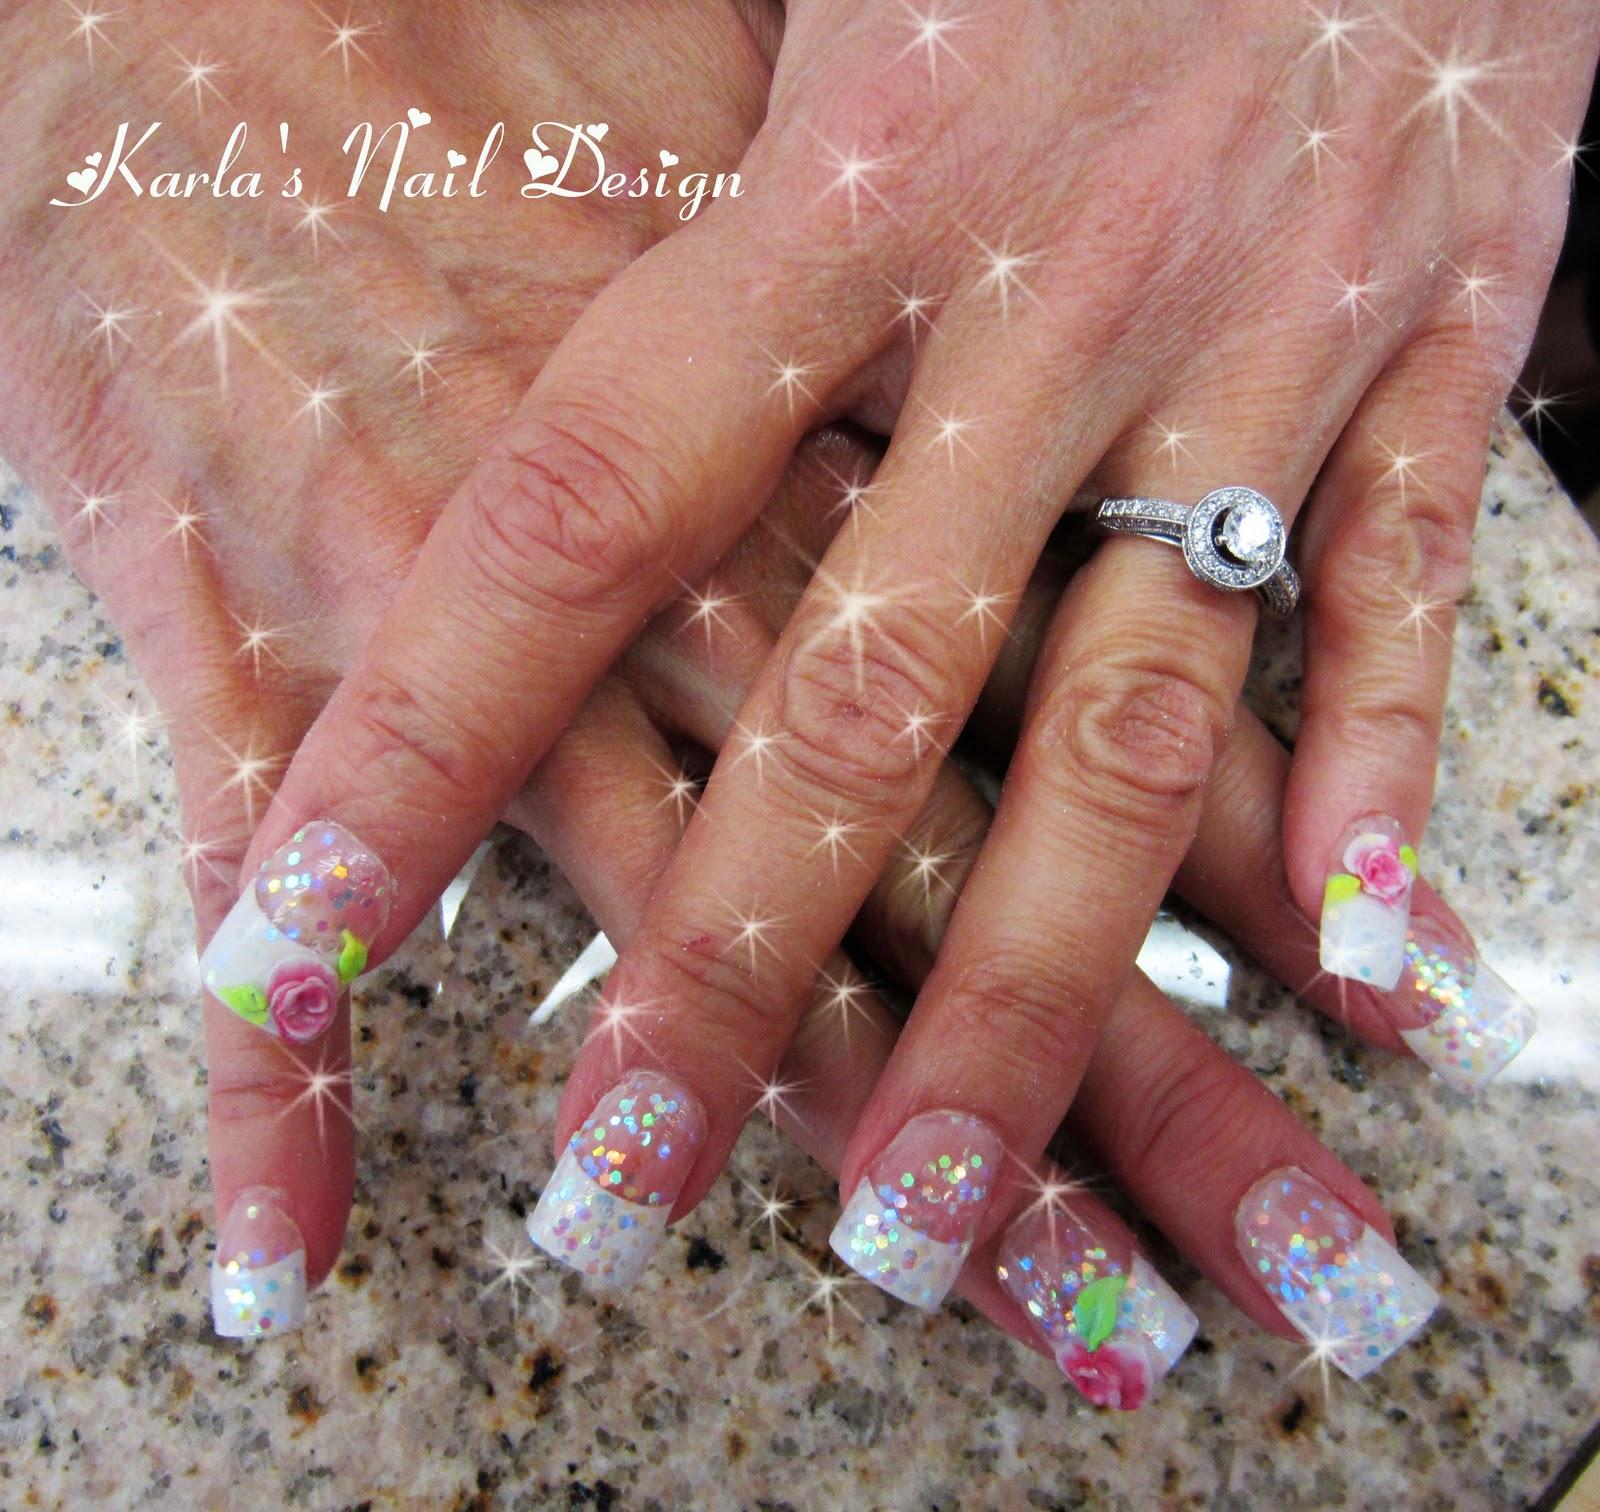 White Tip Nail Designs - Pccala